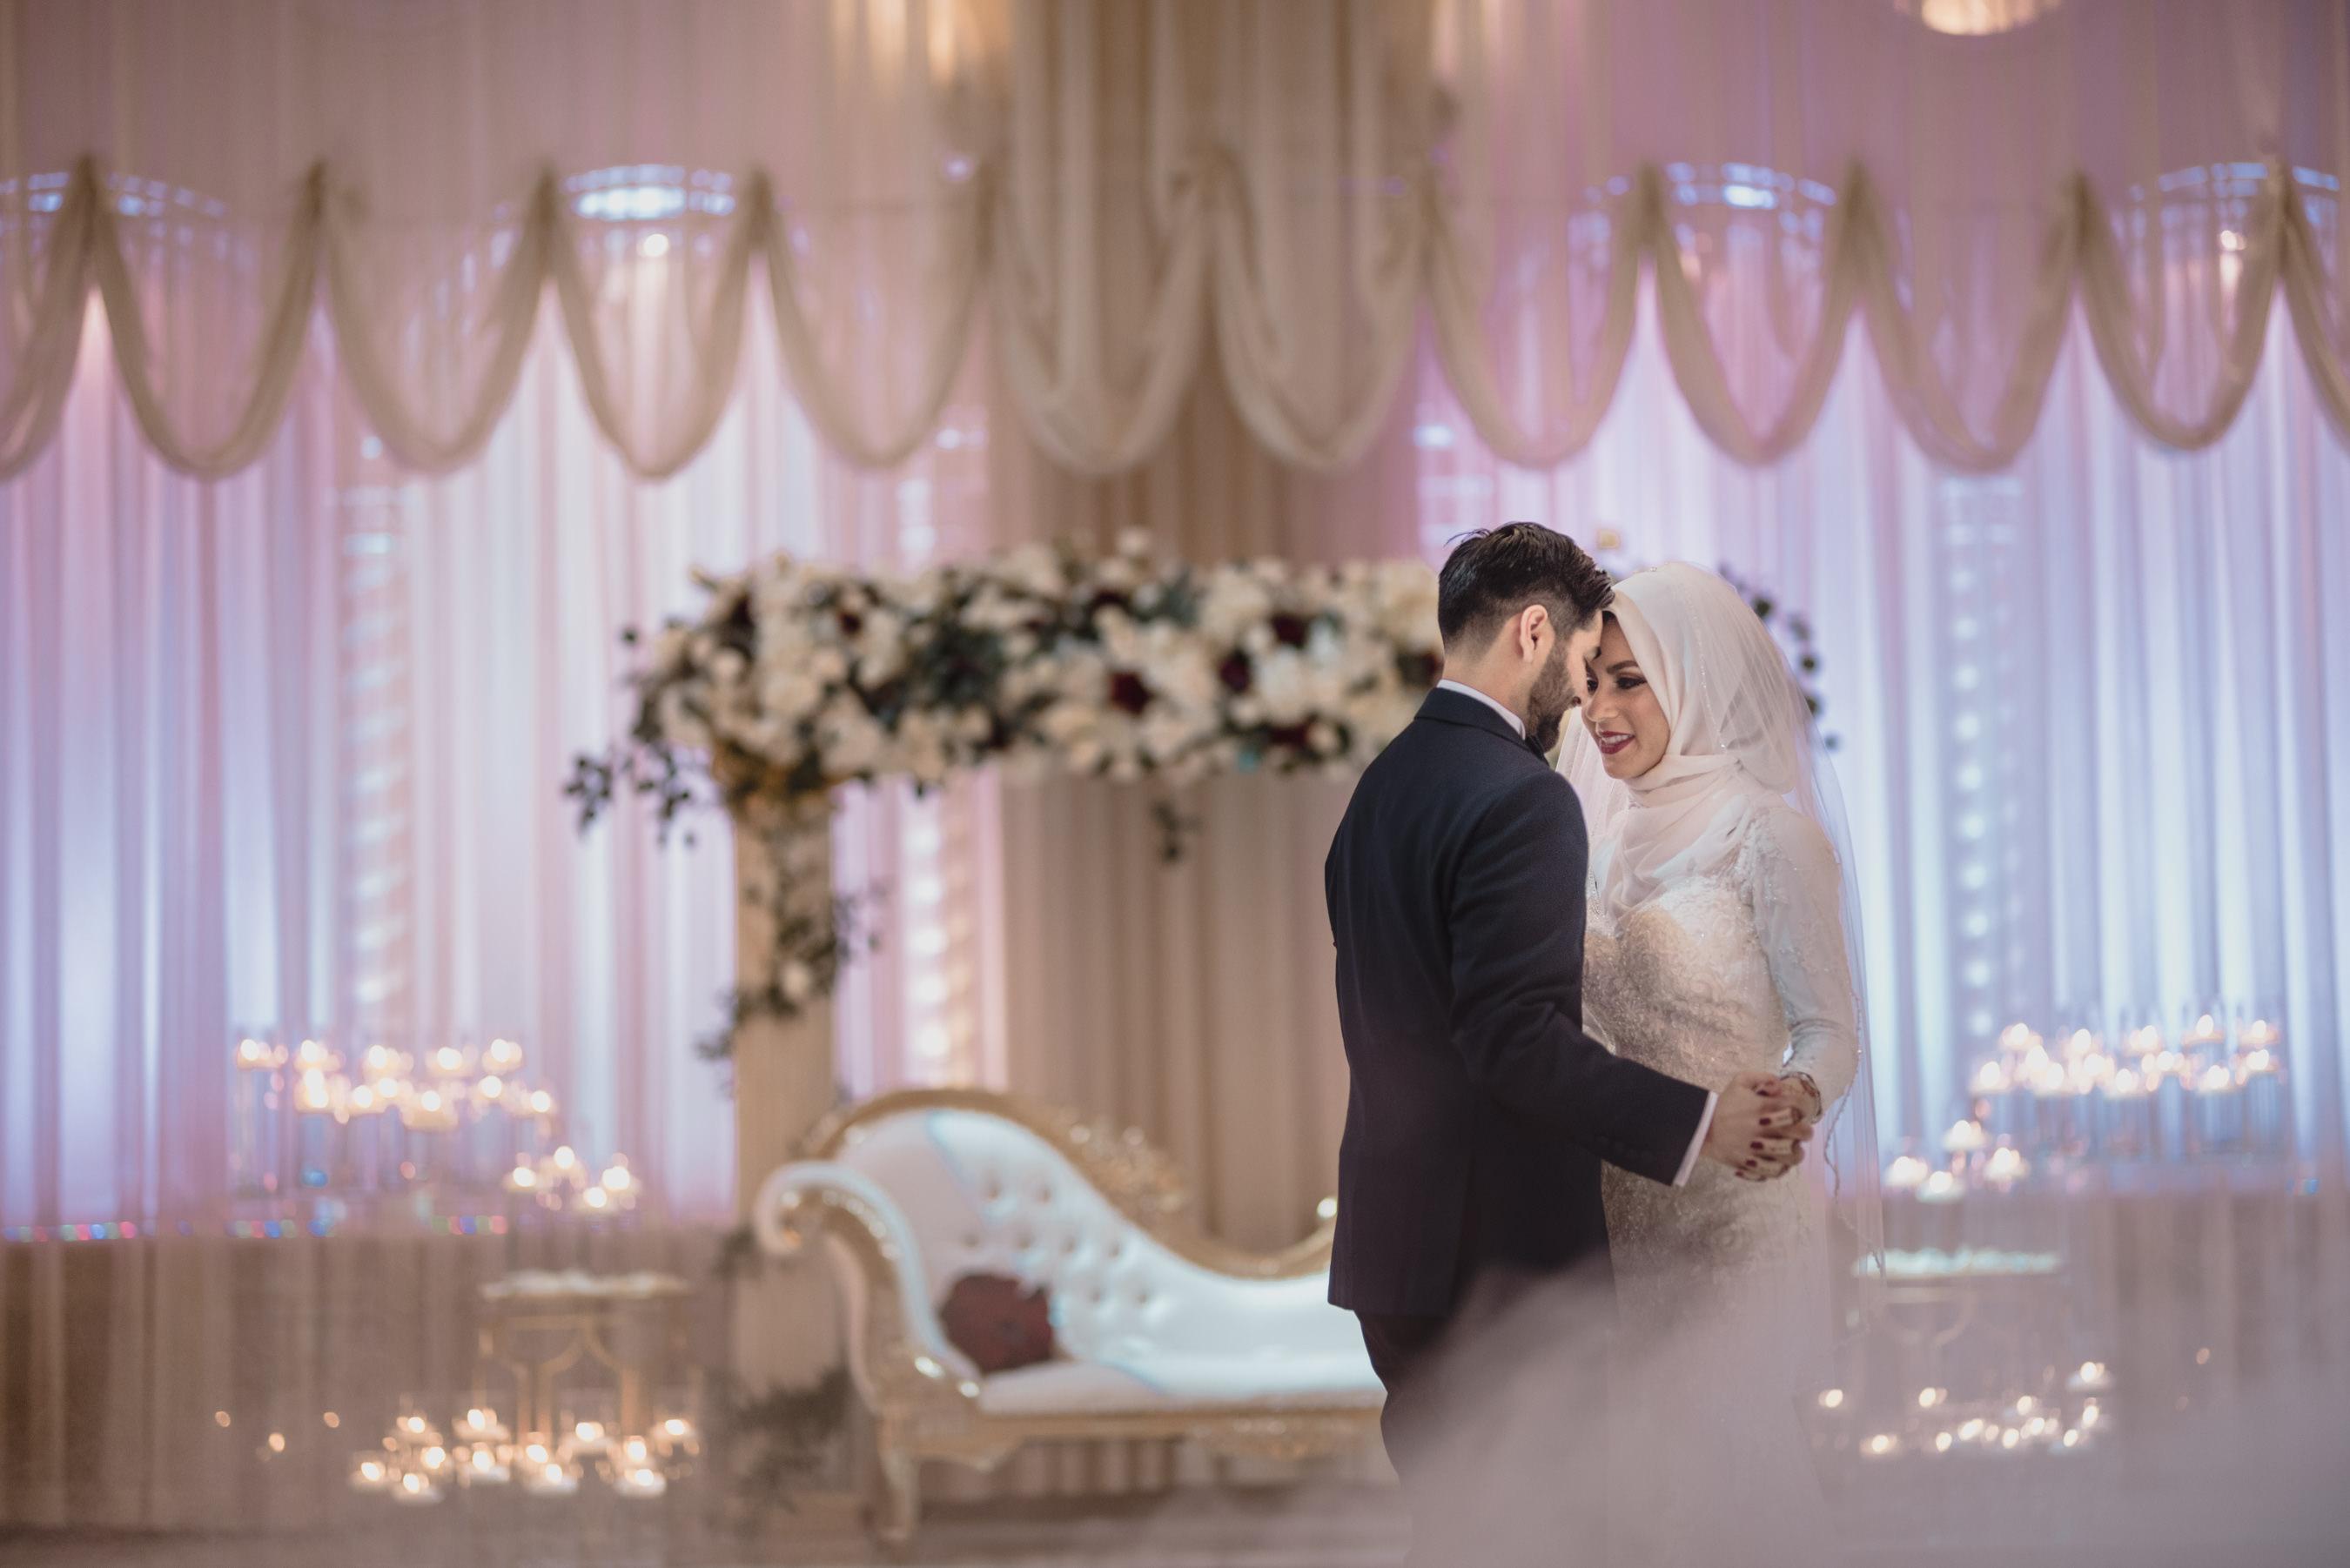 First dance bride and groom in Glendale.jpg